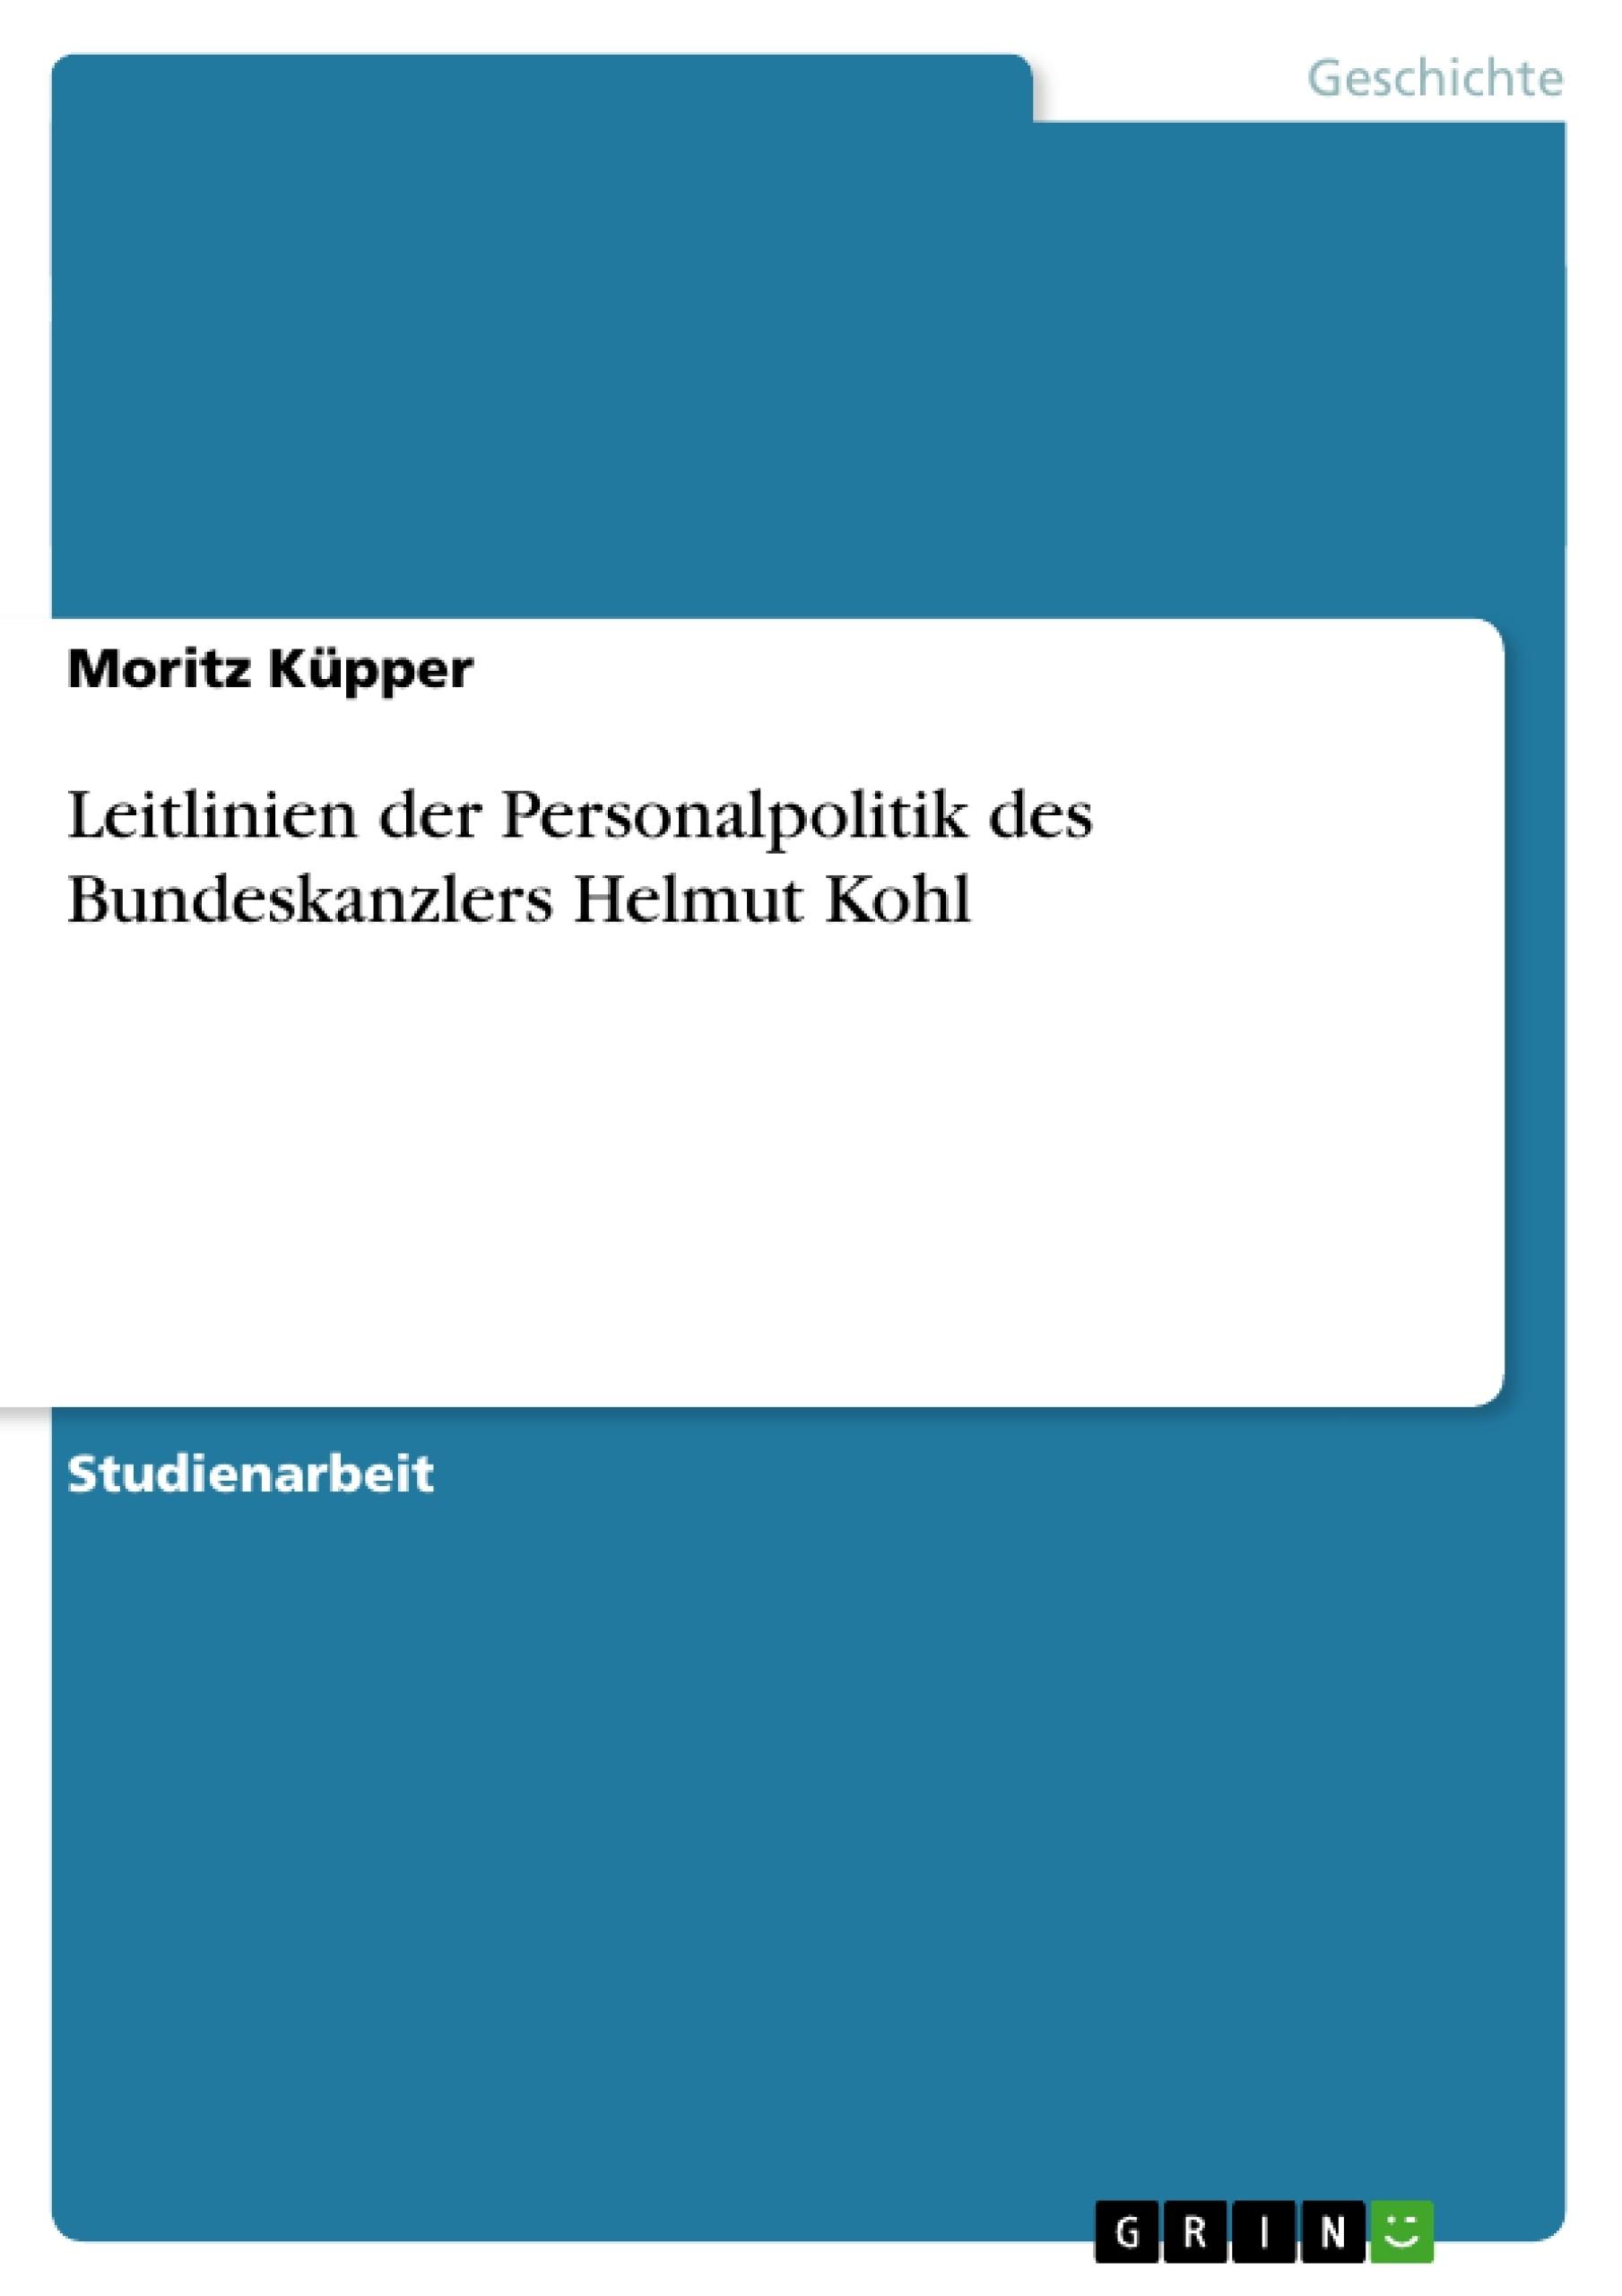 Titel: Leitlinien der Personalpolitik des Bundeskanzlers Helmut Kohl